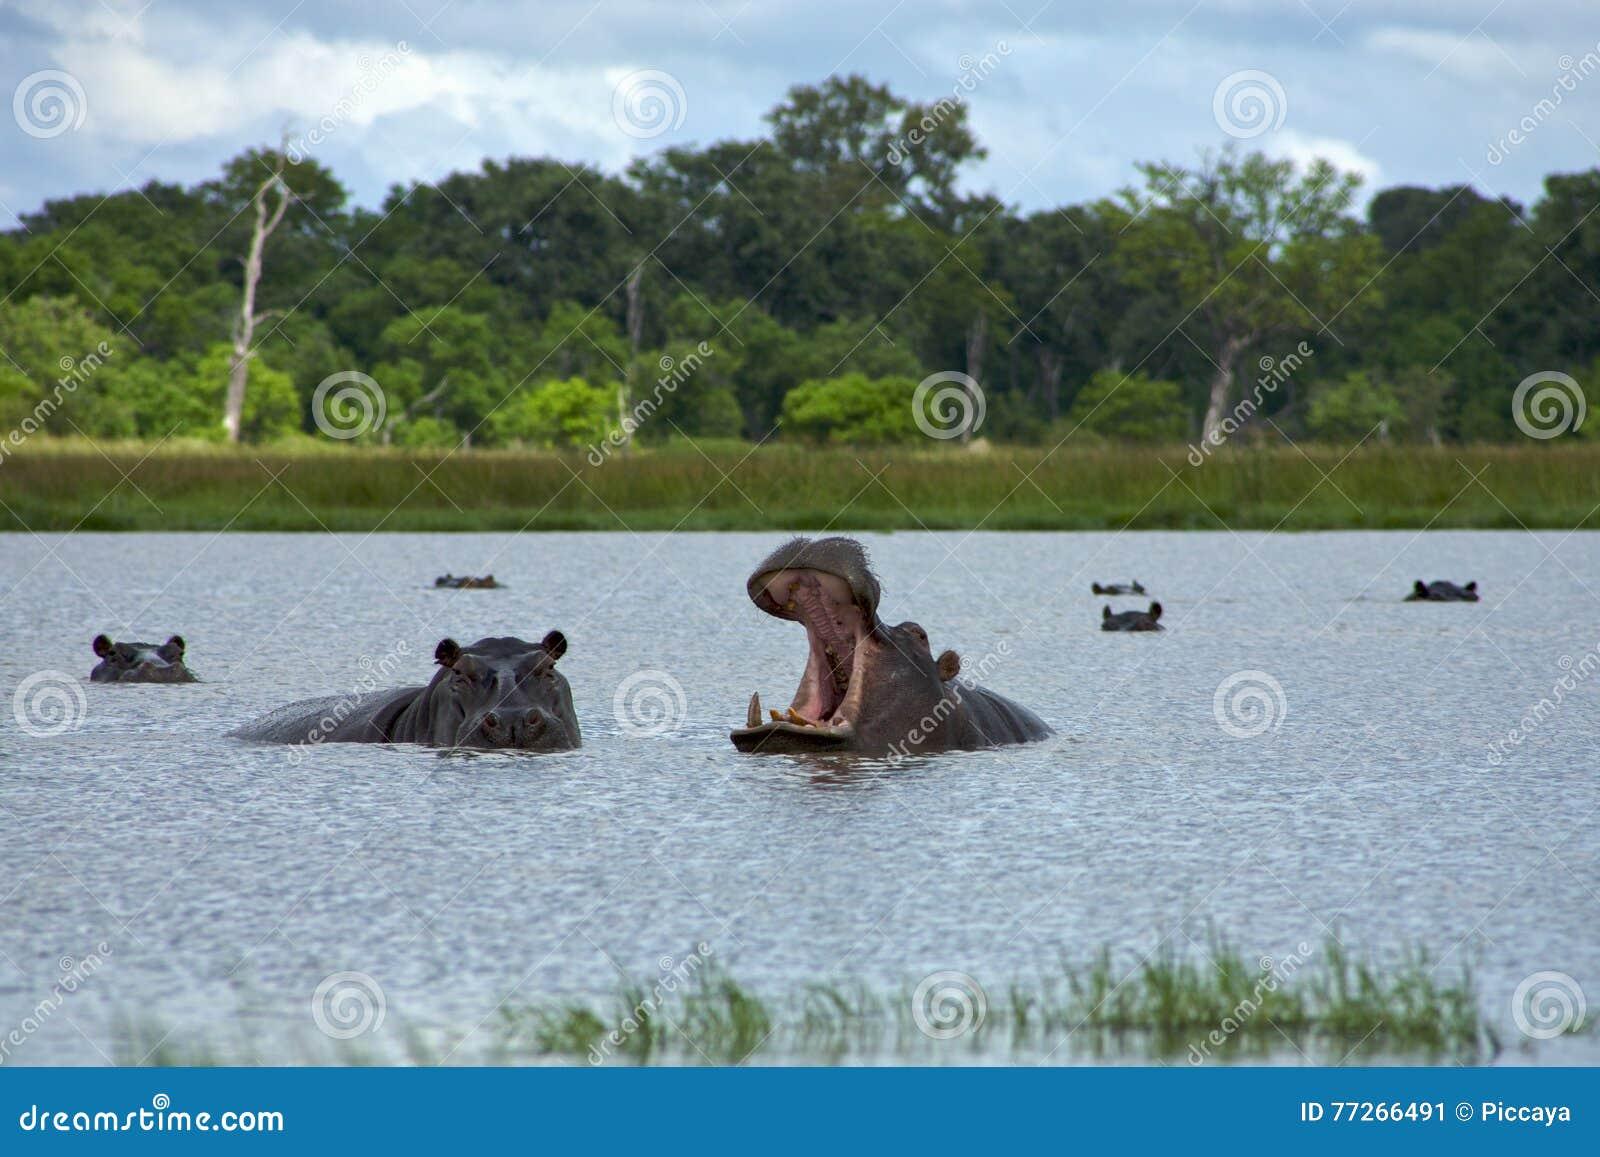 Hippopotamus in Okavango Delta - Moremi National Park